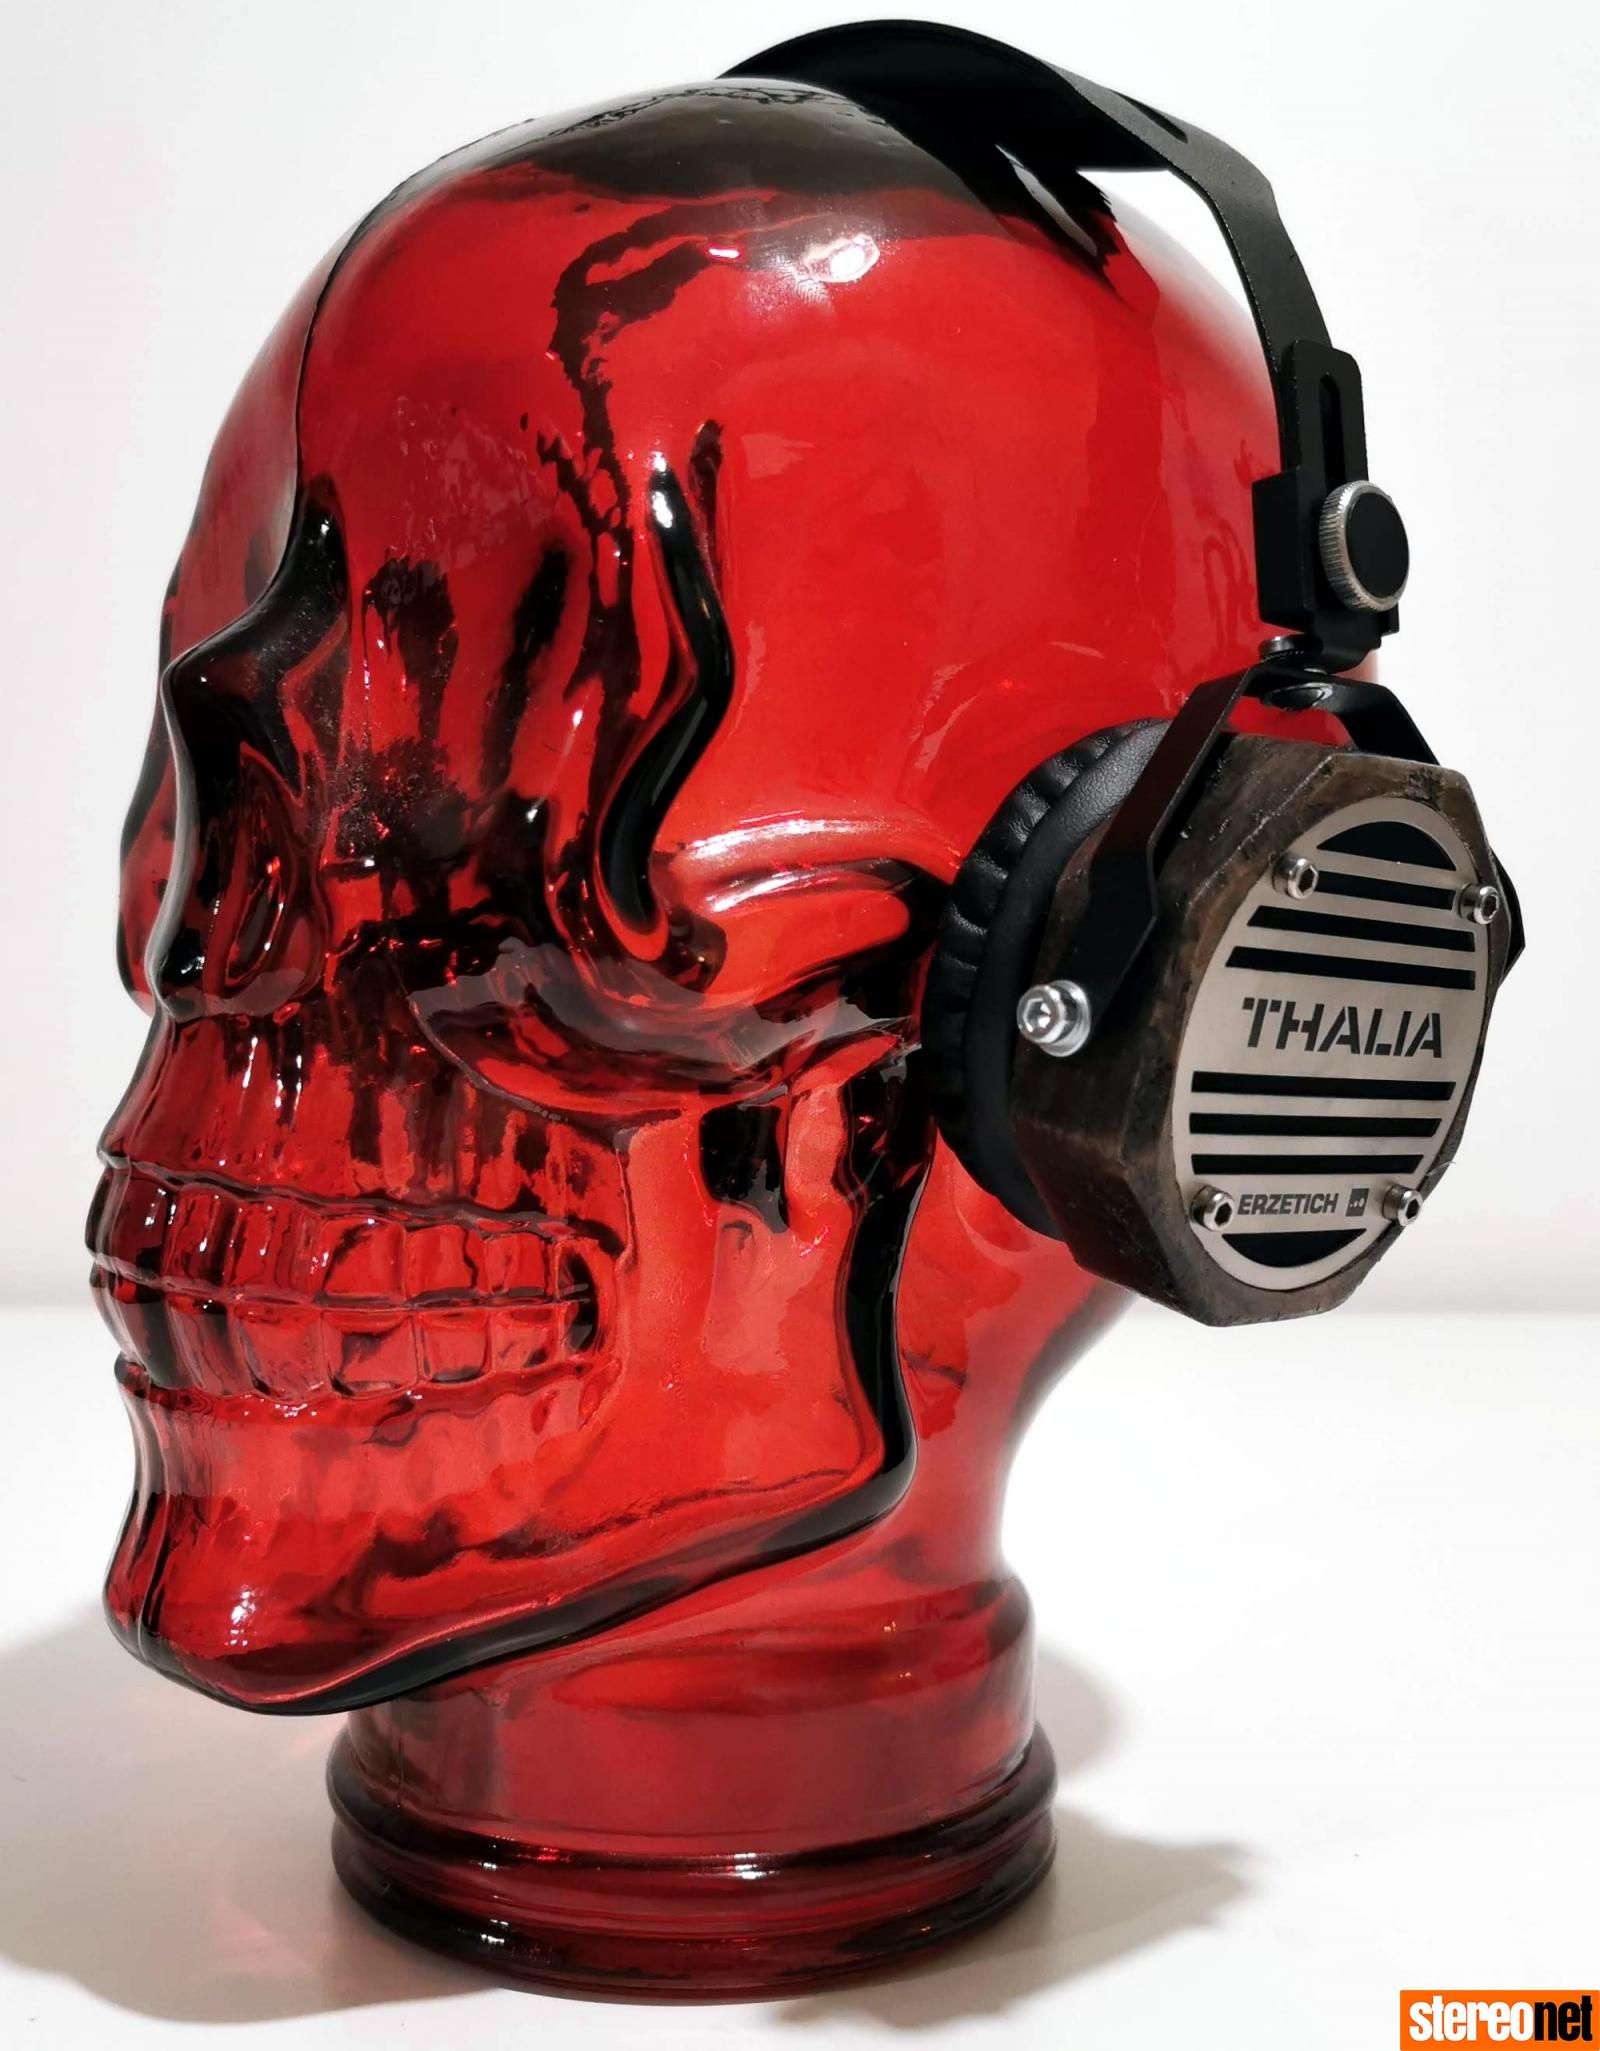 Erzetich Thalia headphones Review